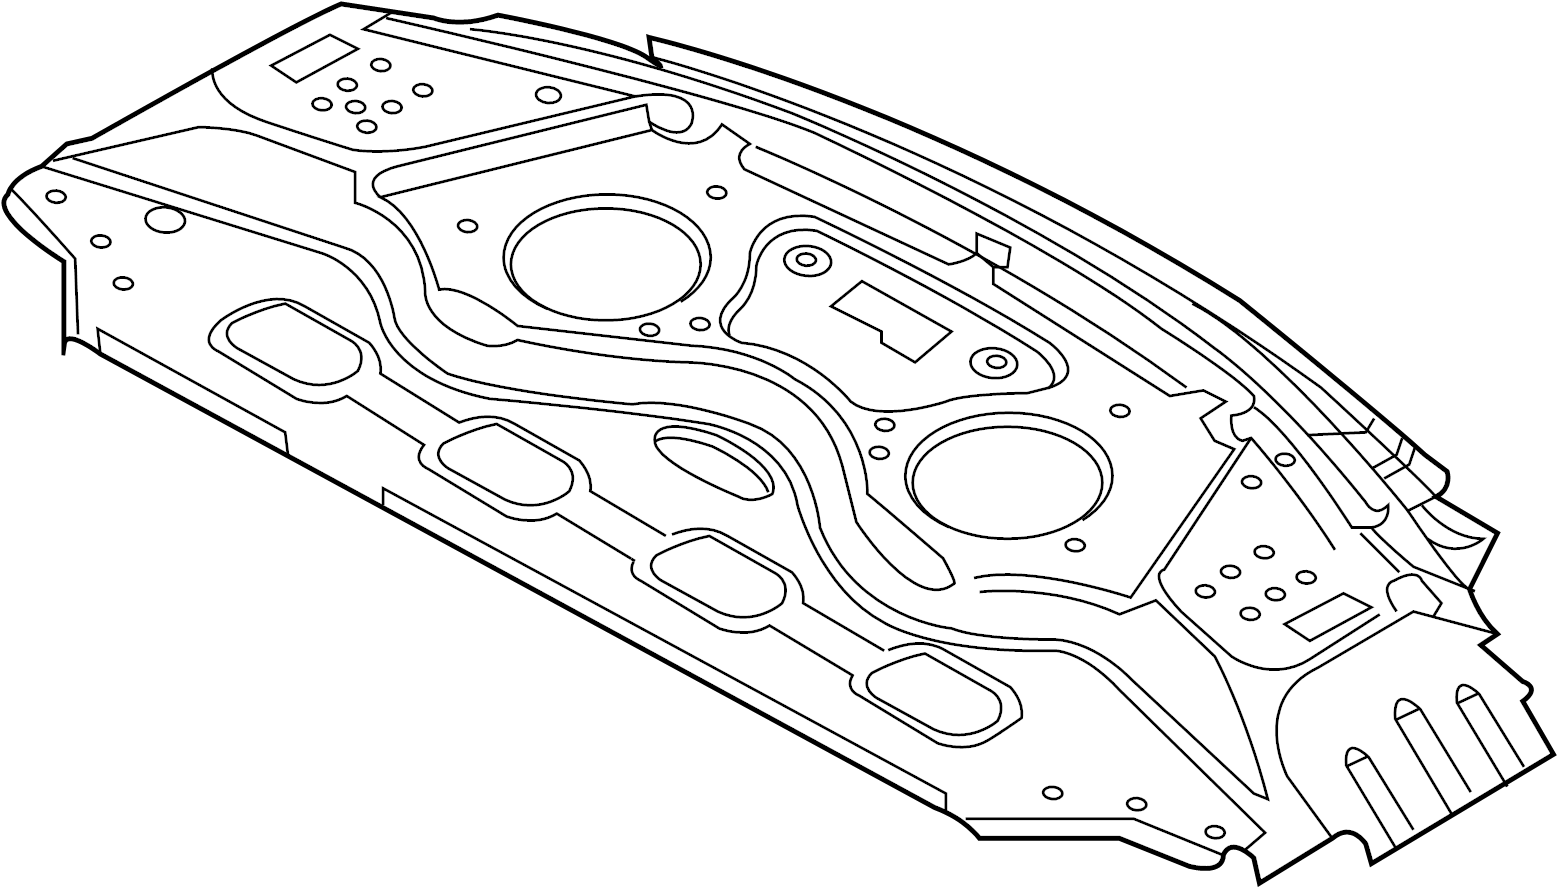 Jaguar Xjr575 Insulator Upper Body Rover Rear Left